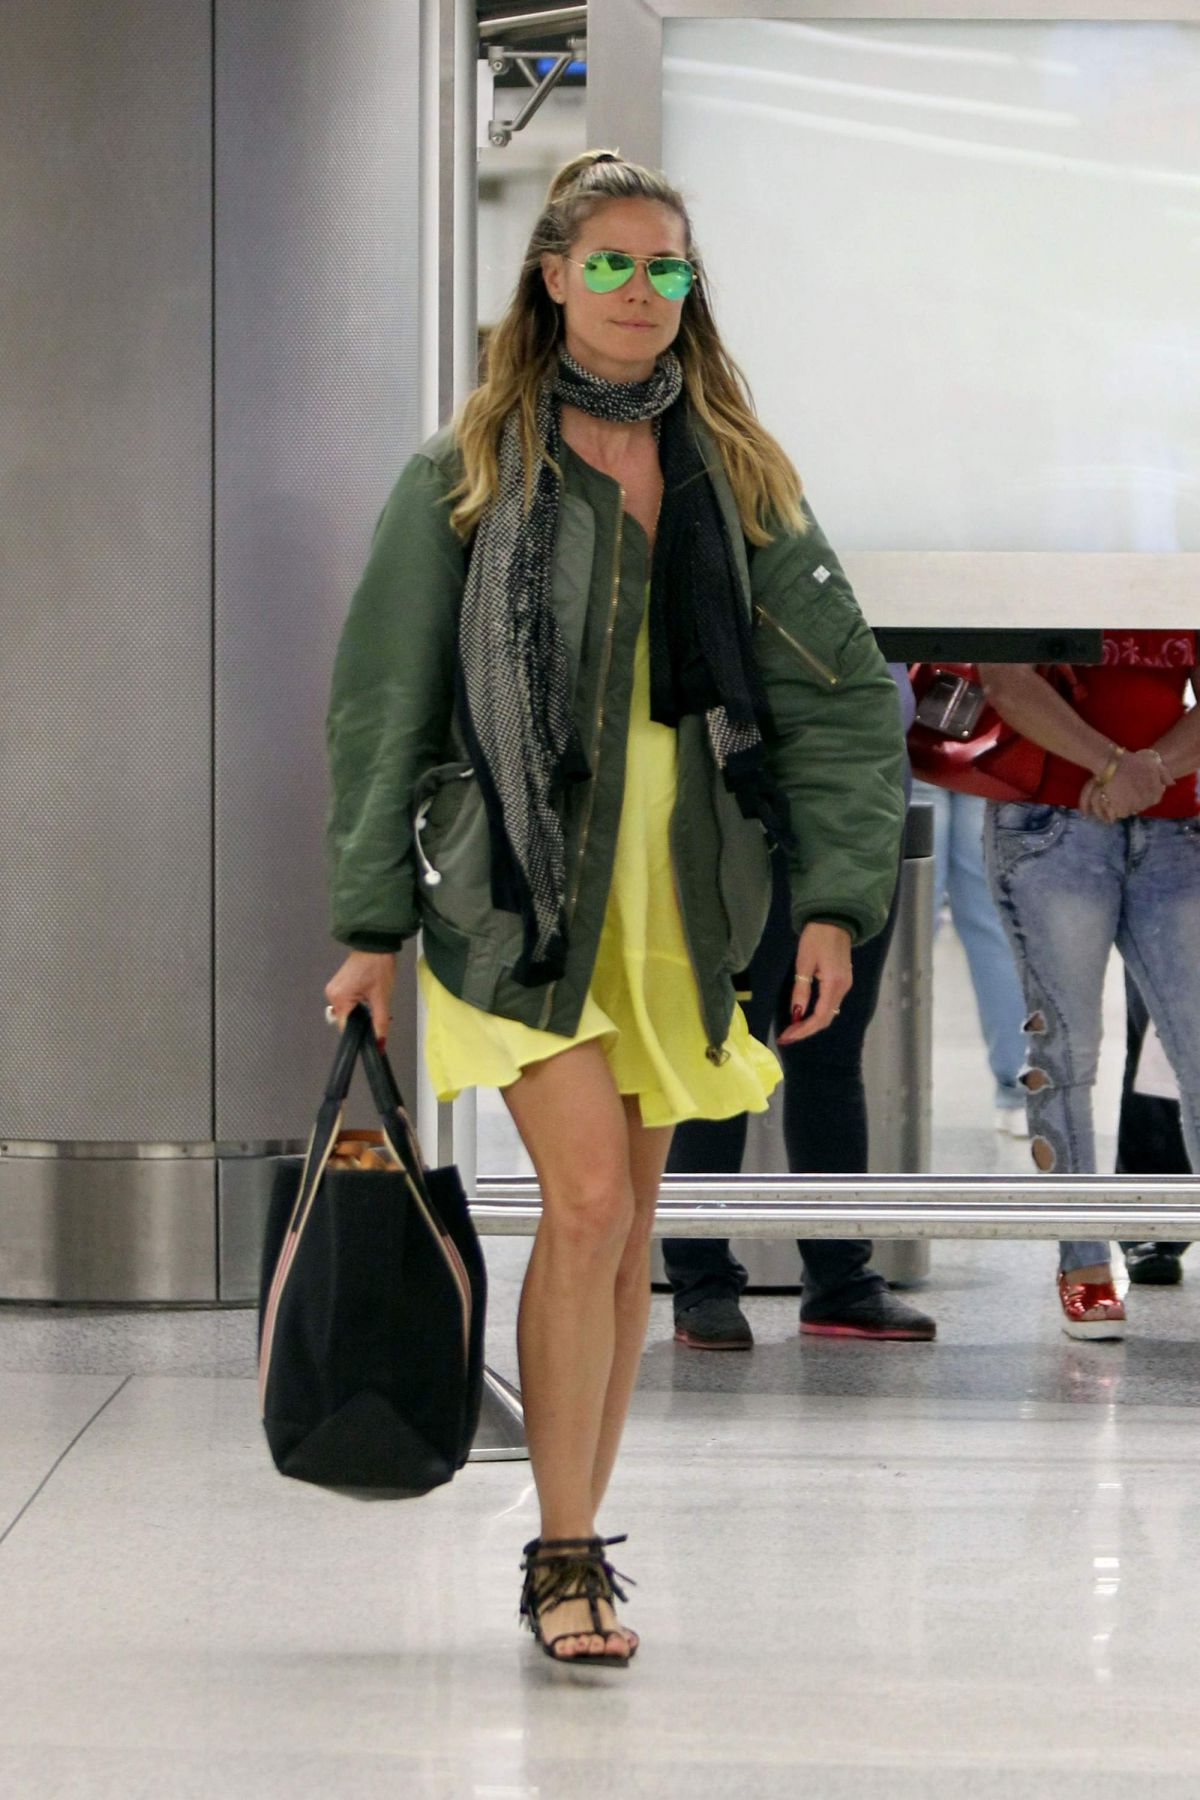 HEIDI KLUM at LAX Airport in Los Angeles 01/06/2016